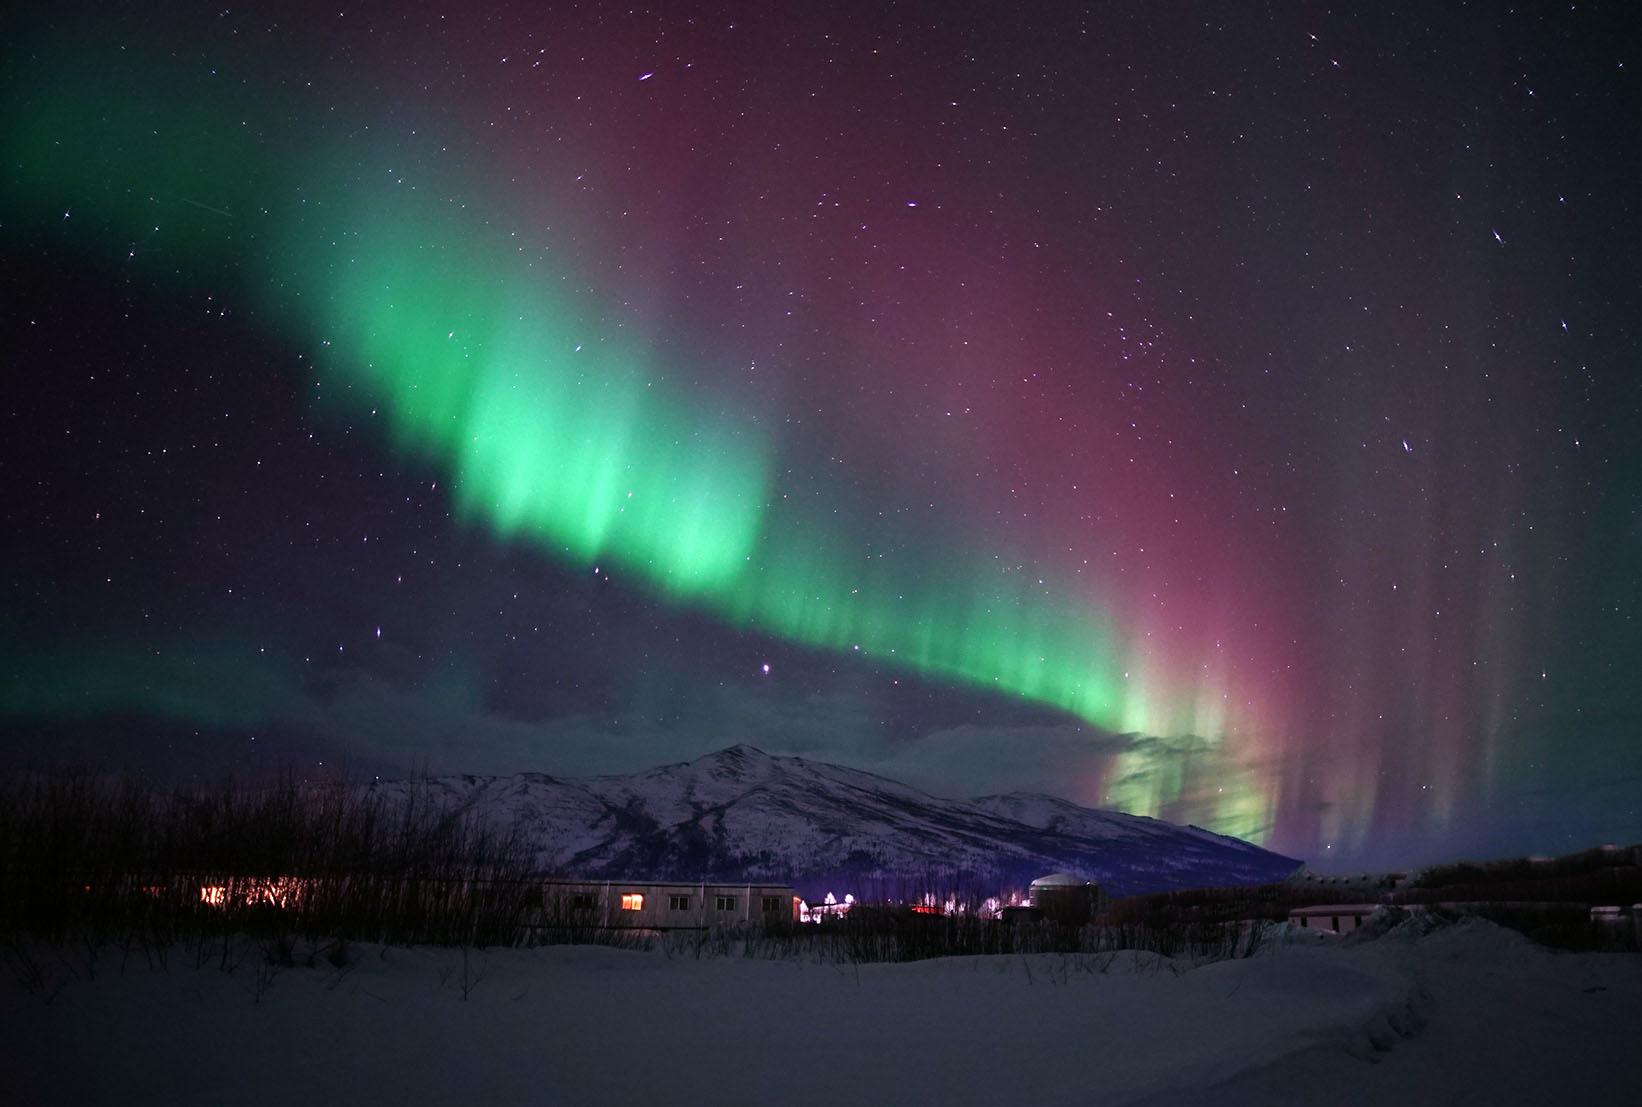 Colorful aurora borealis over Slate Mountain by Kenji Sato.